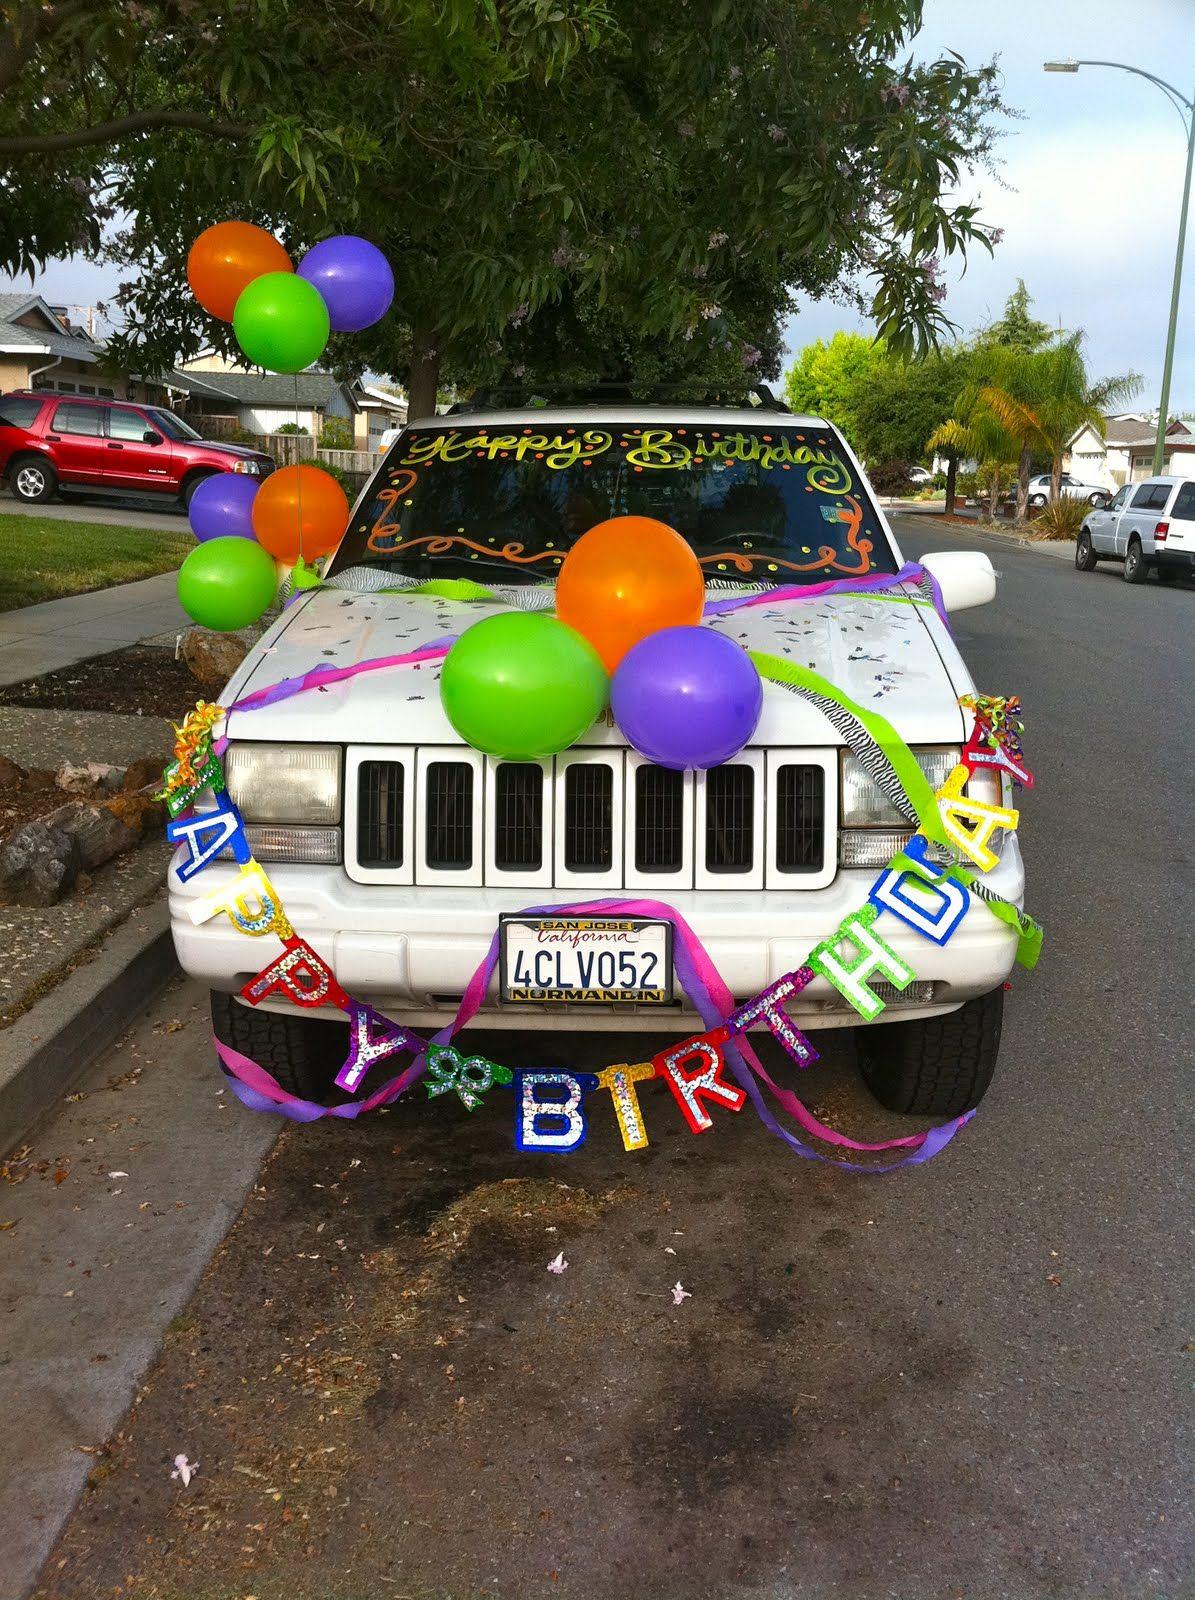 decorate car for birthday birthdays pinterest decorating birthdays and cars. Black Bedroom Furniture Sets. Home Design Ideas